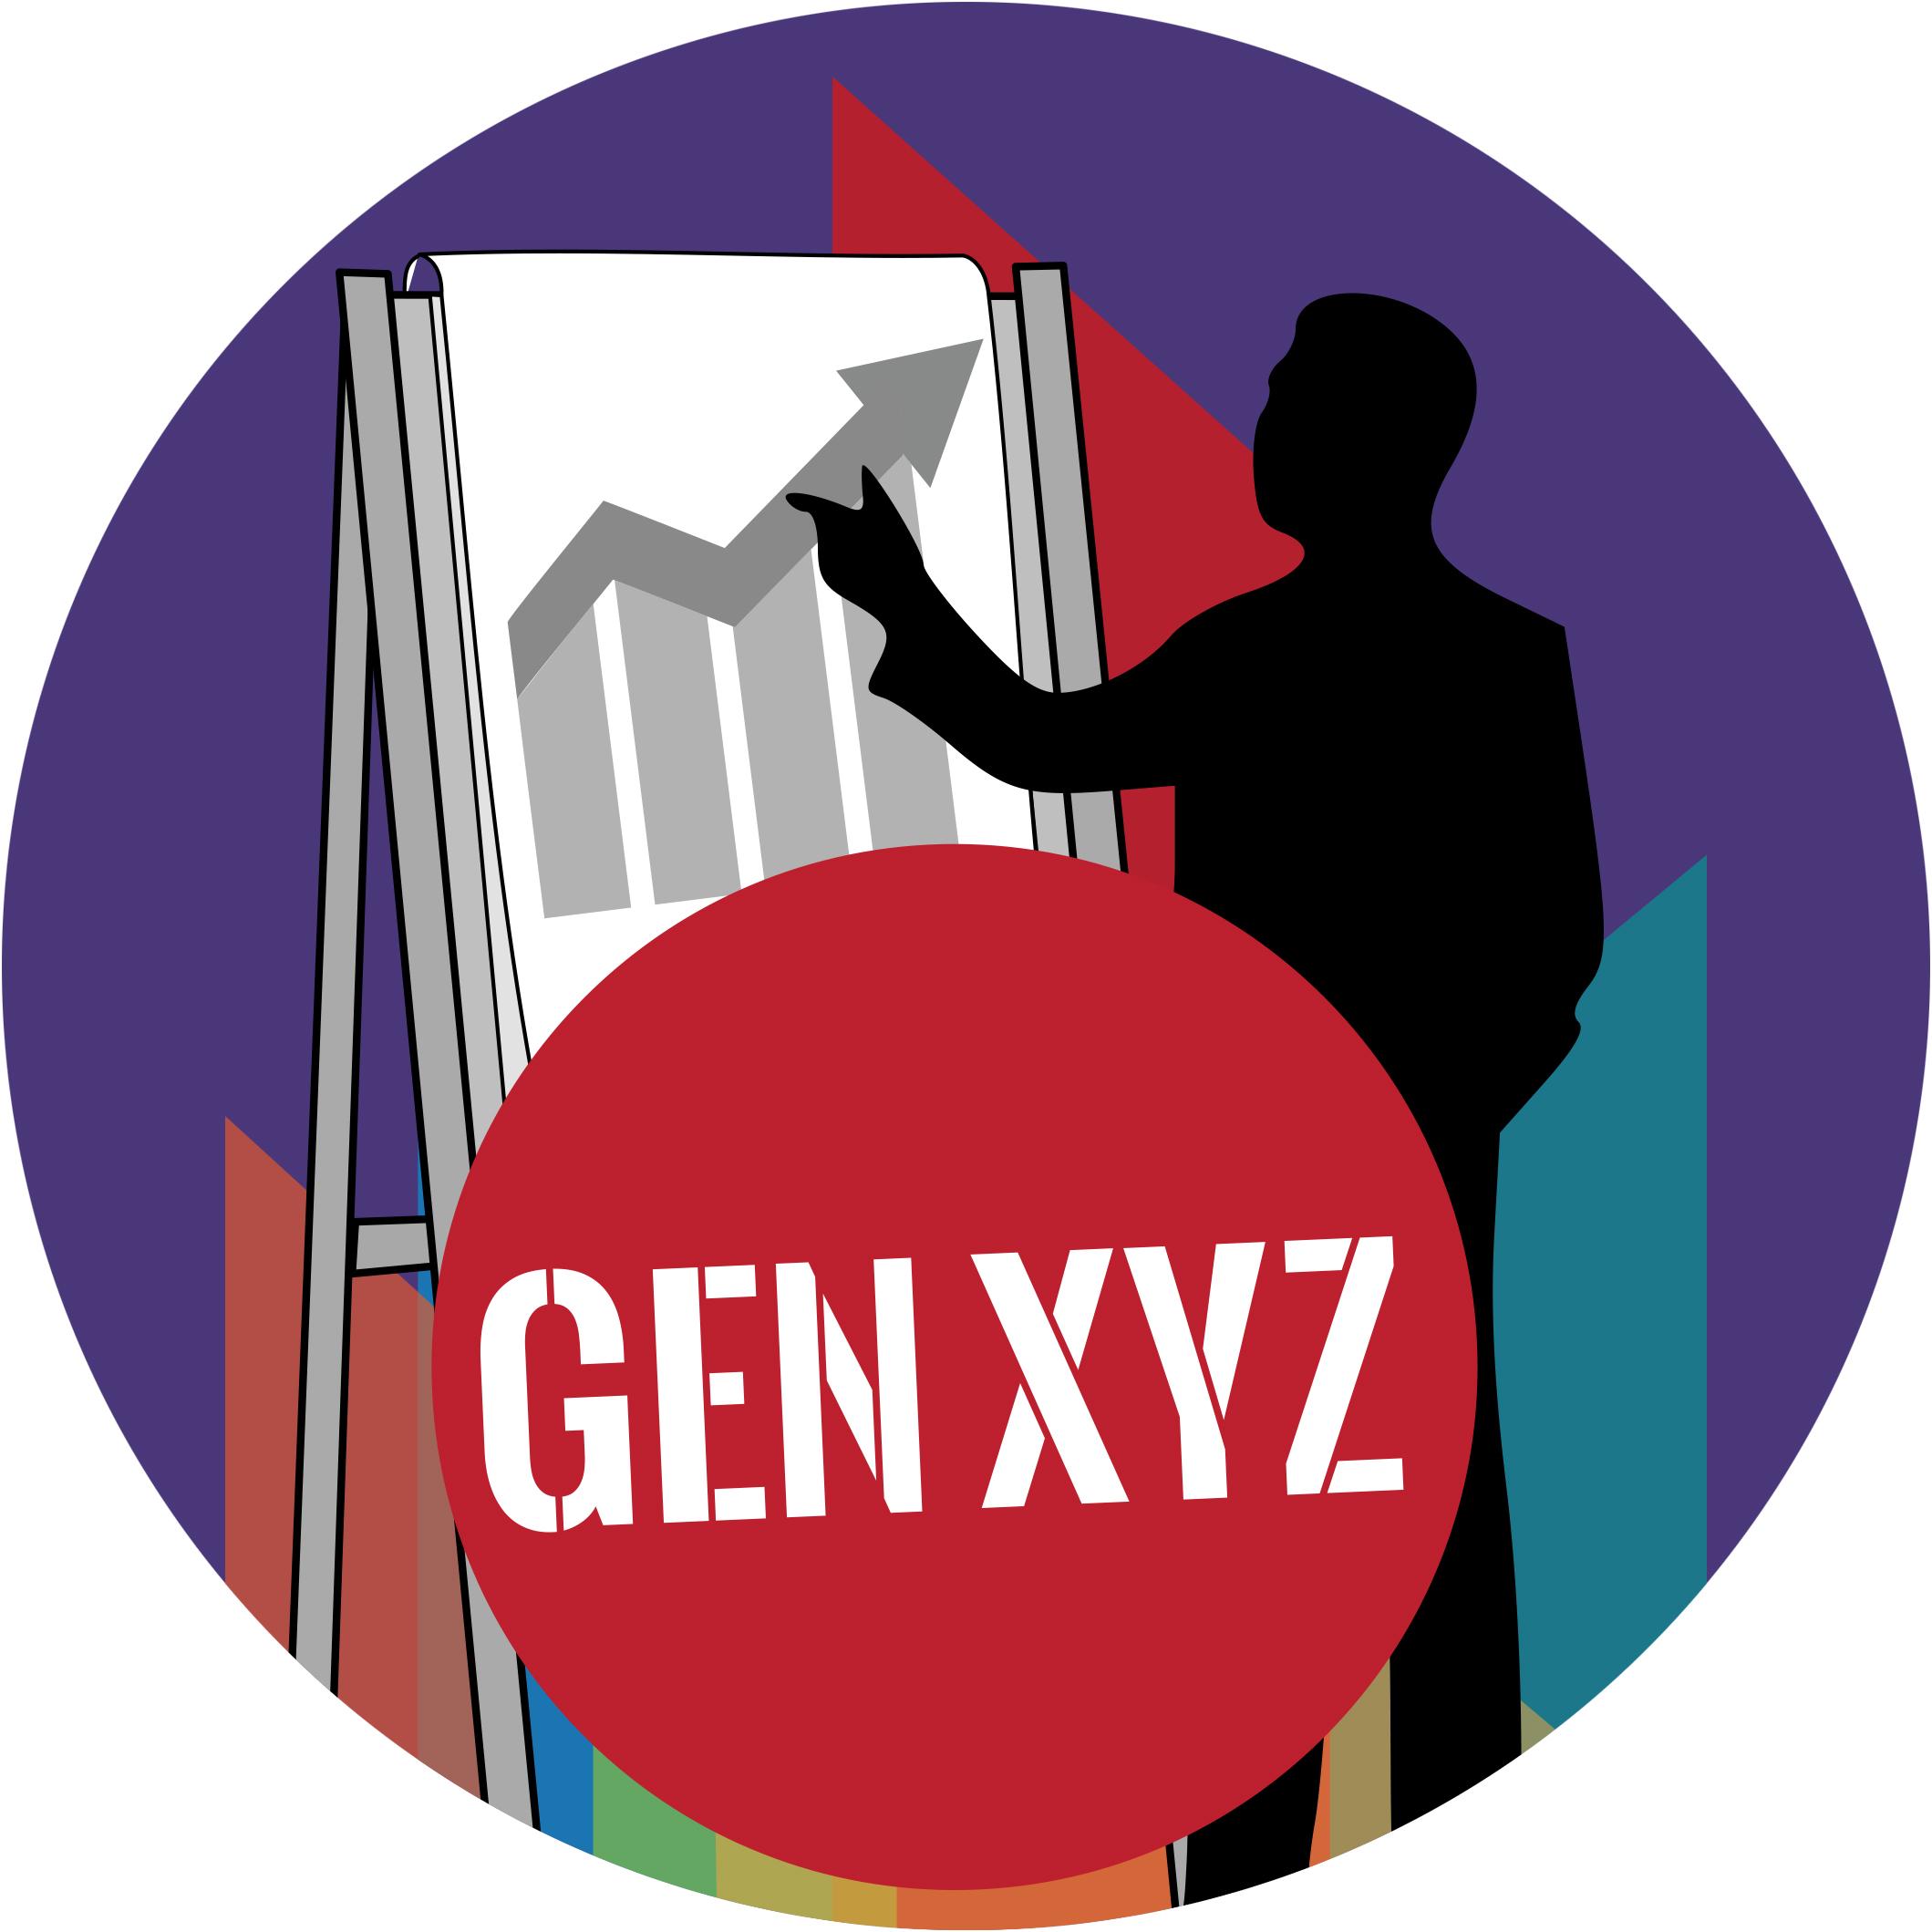 Graphic-GENXYZ-1.jpg